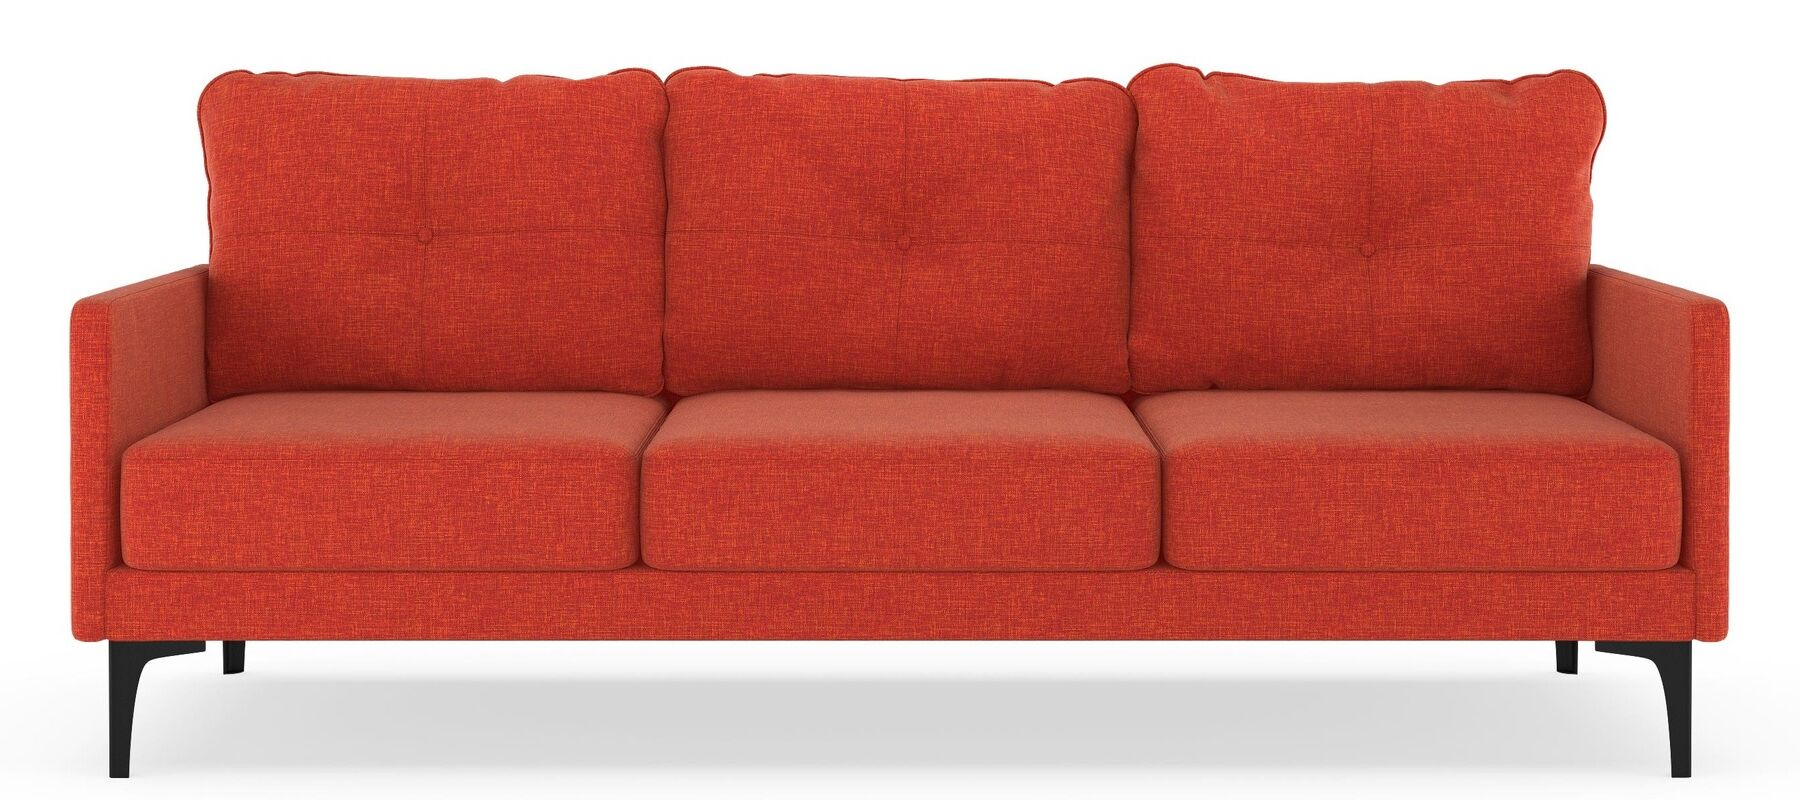 Cronin Sofa Upholstery: Raven Gray, Finish: Brass